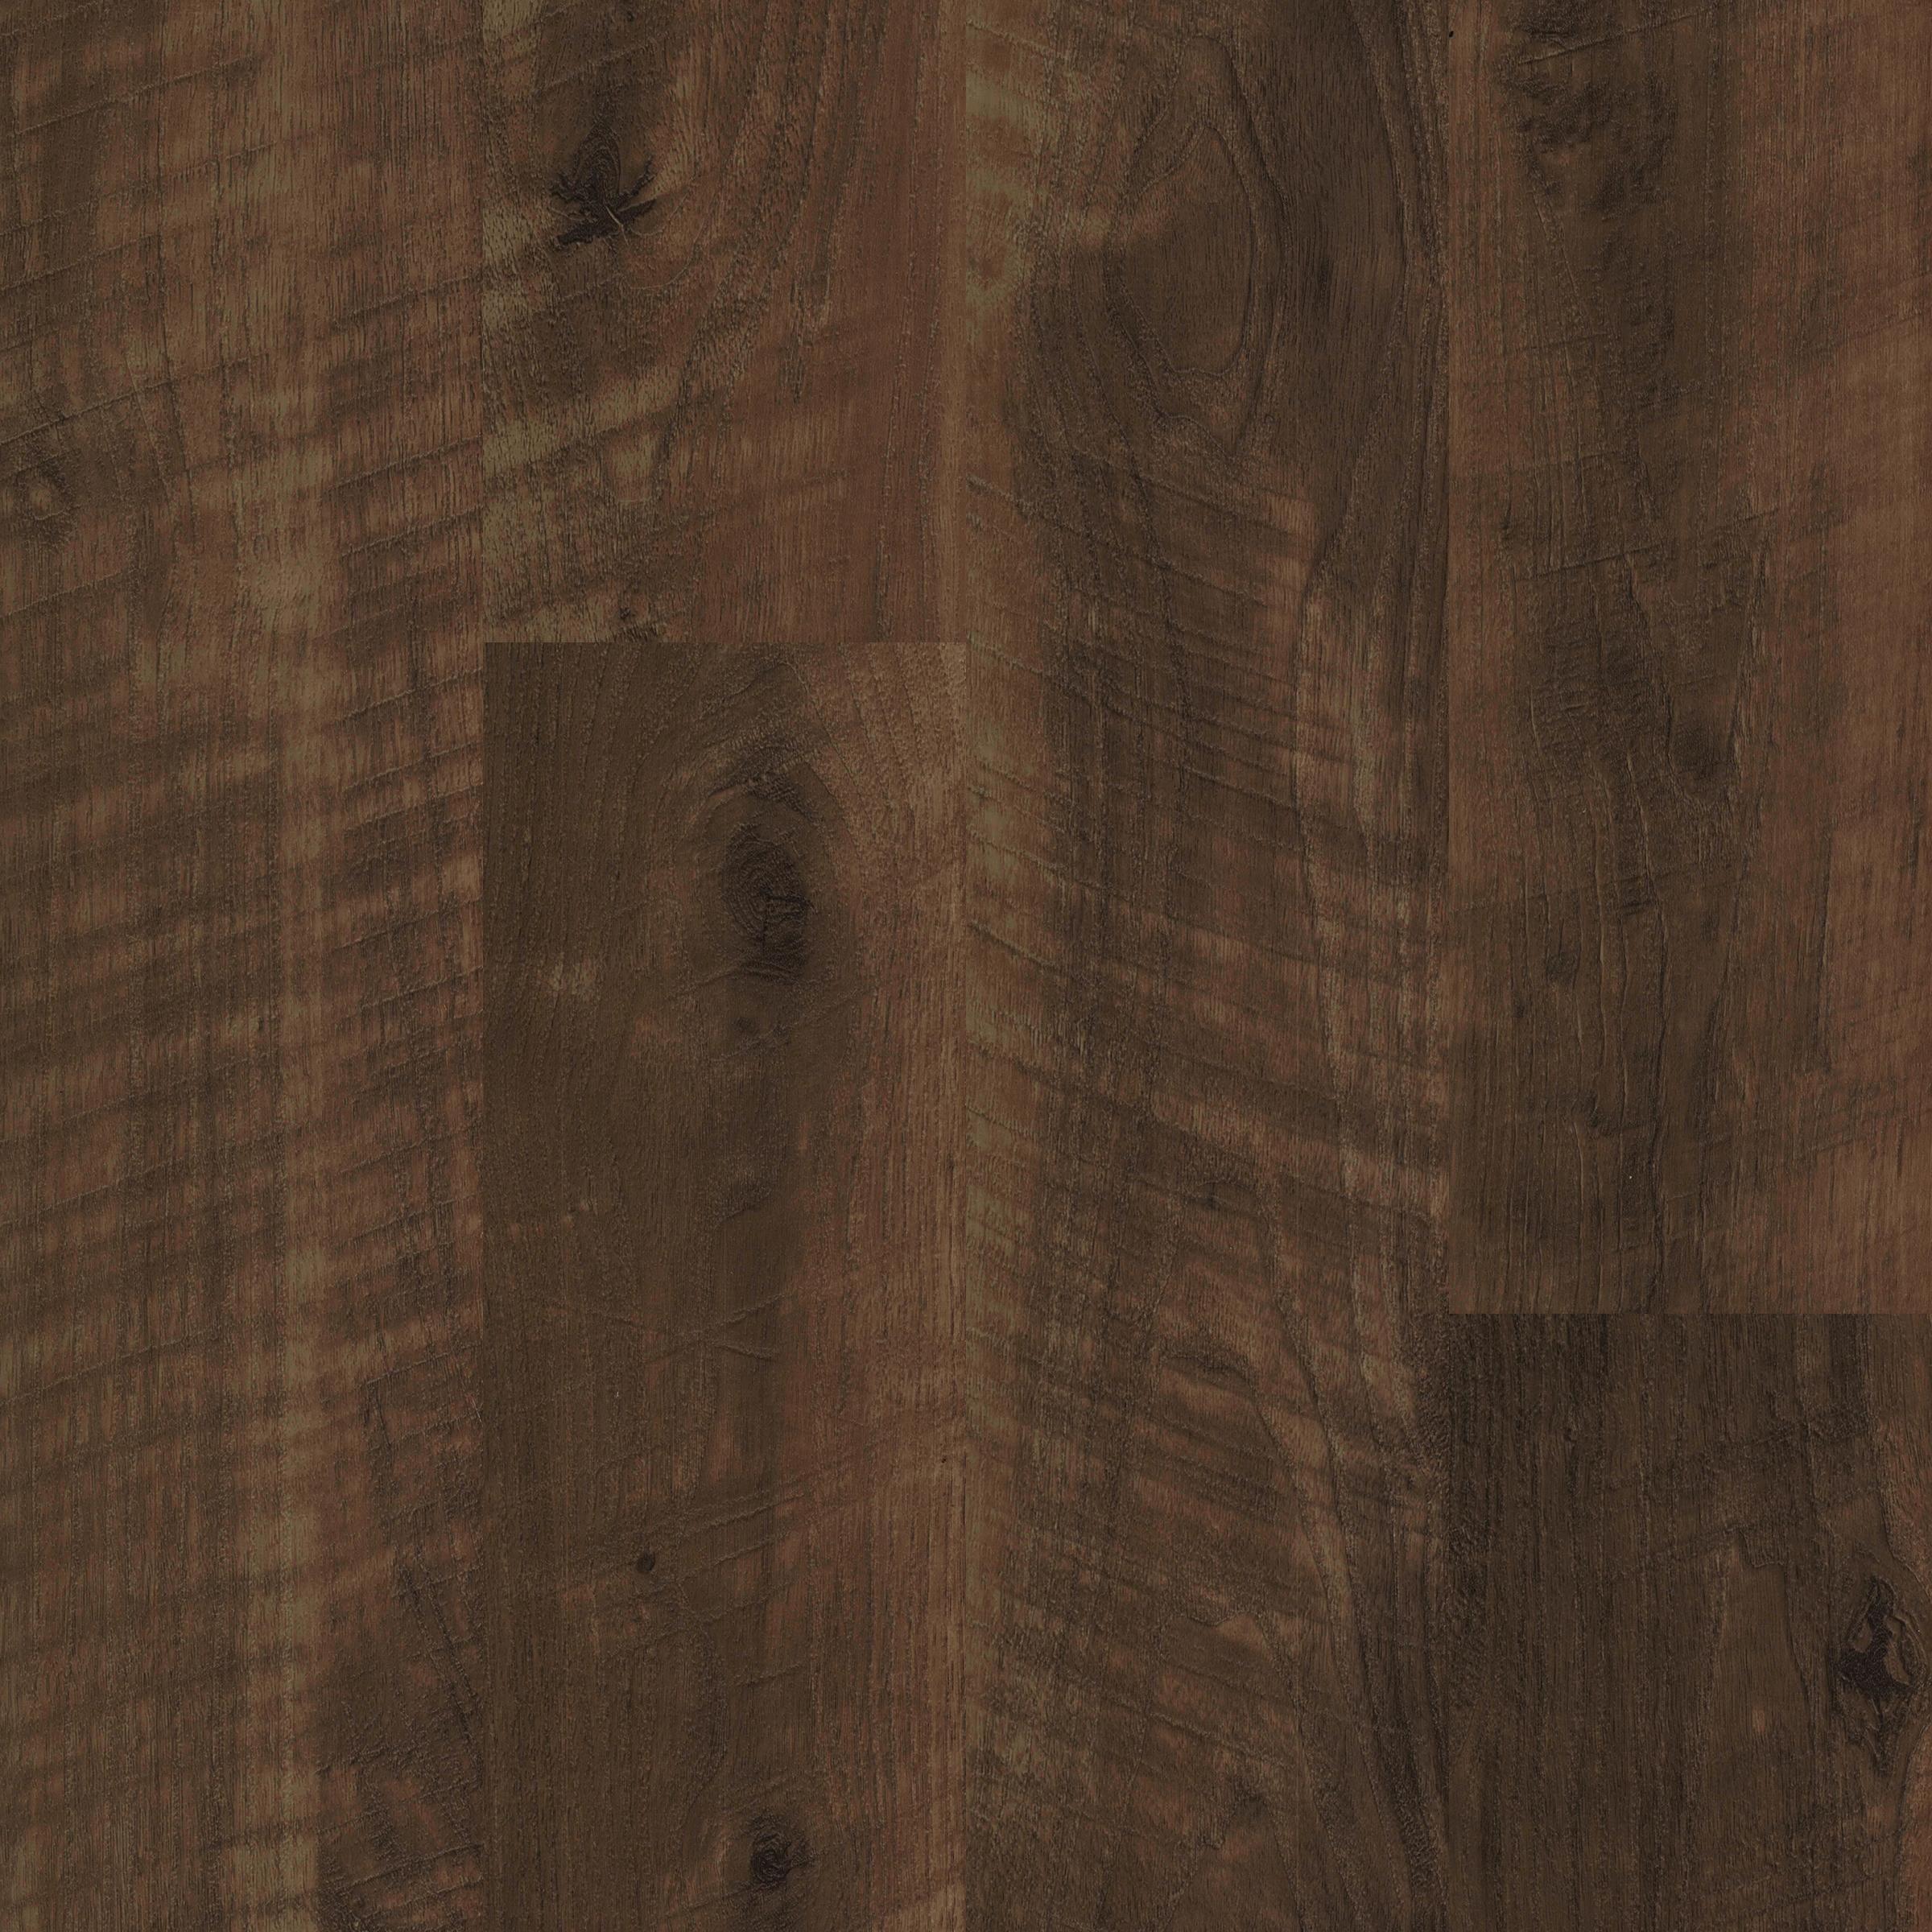 Nouveax Rigid Core Coretec Style Wpc Reclaimed Walnut Waterproof Vinyl Floor Vinyl Plank Flooring Vinyl Plank Luxury Vinyl Plank Flooring